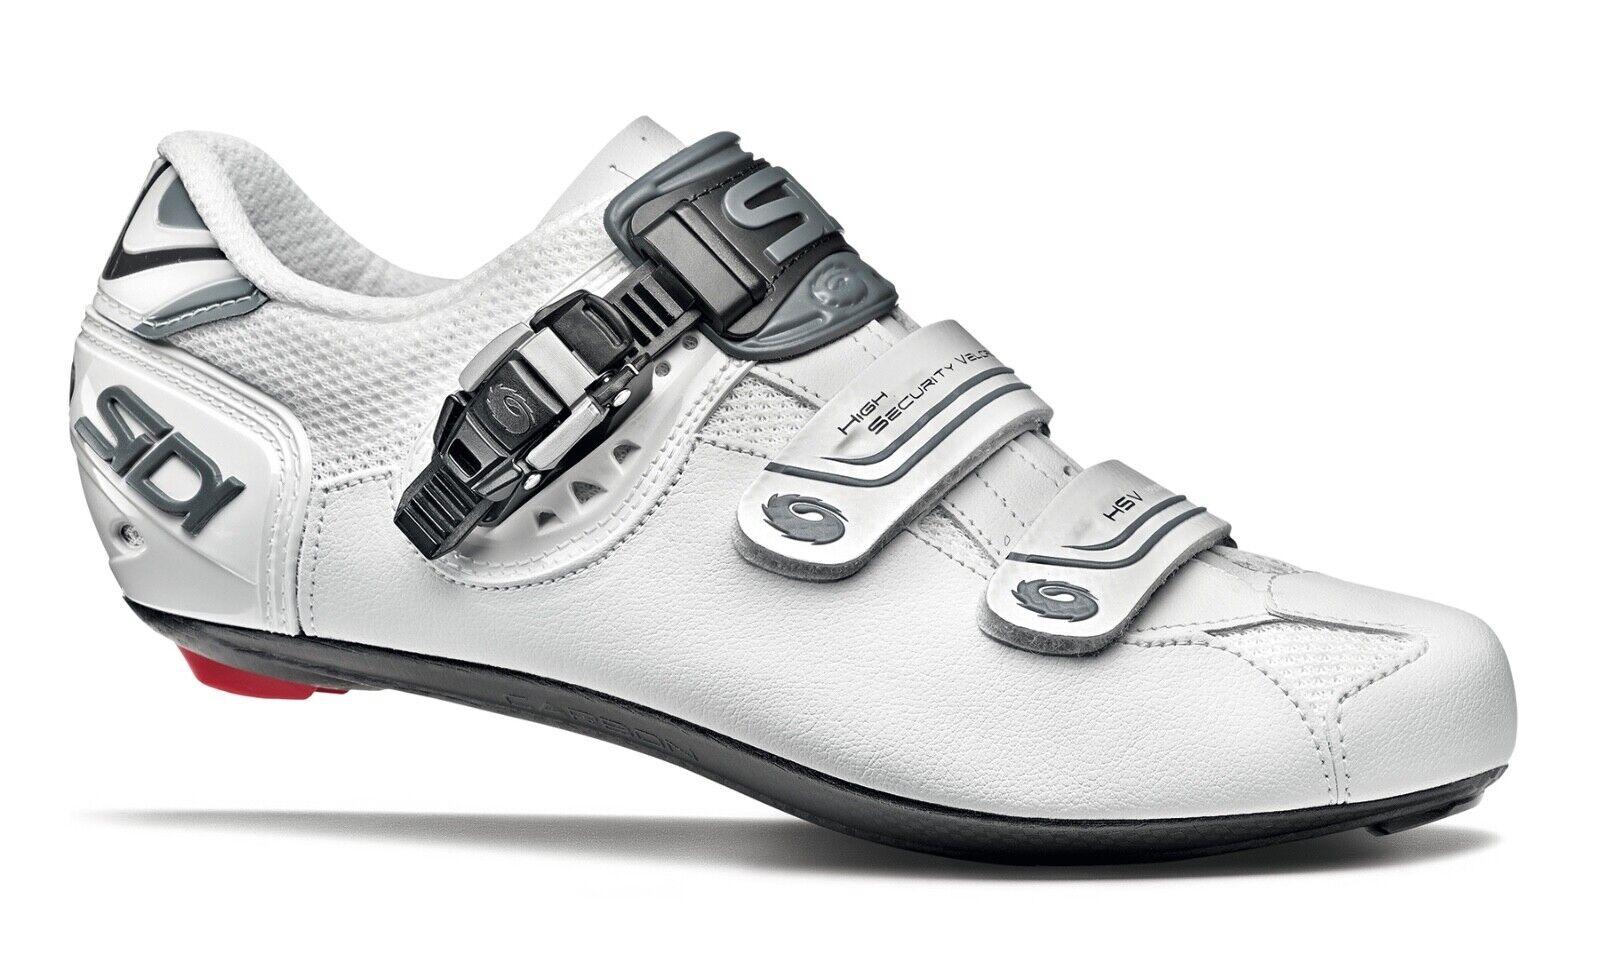 Zapatos blancoos Sidi Genius 7.